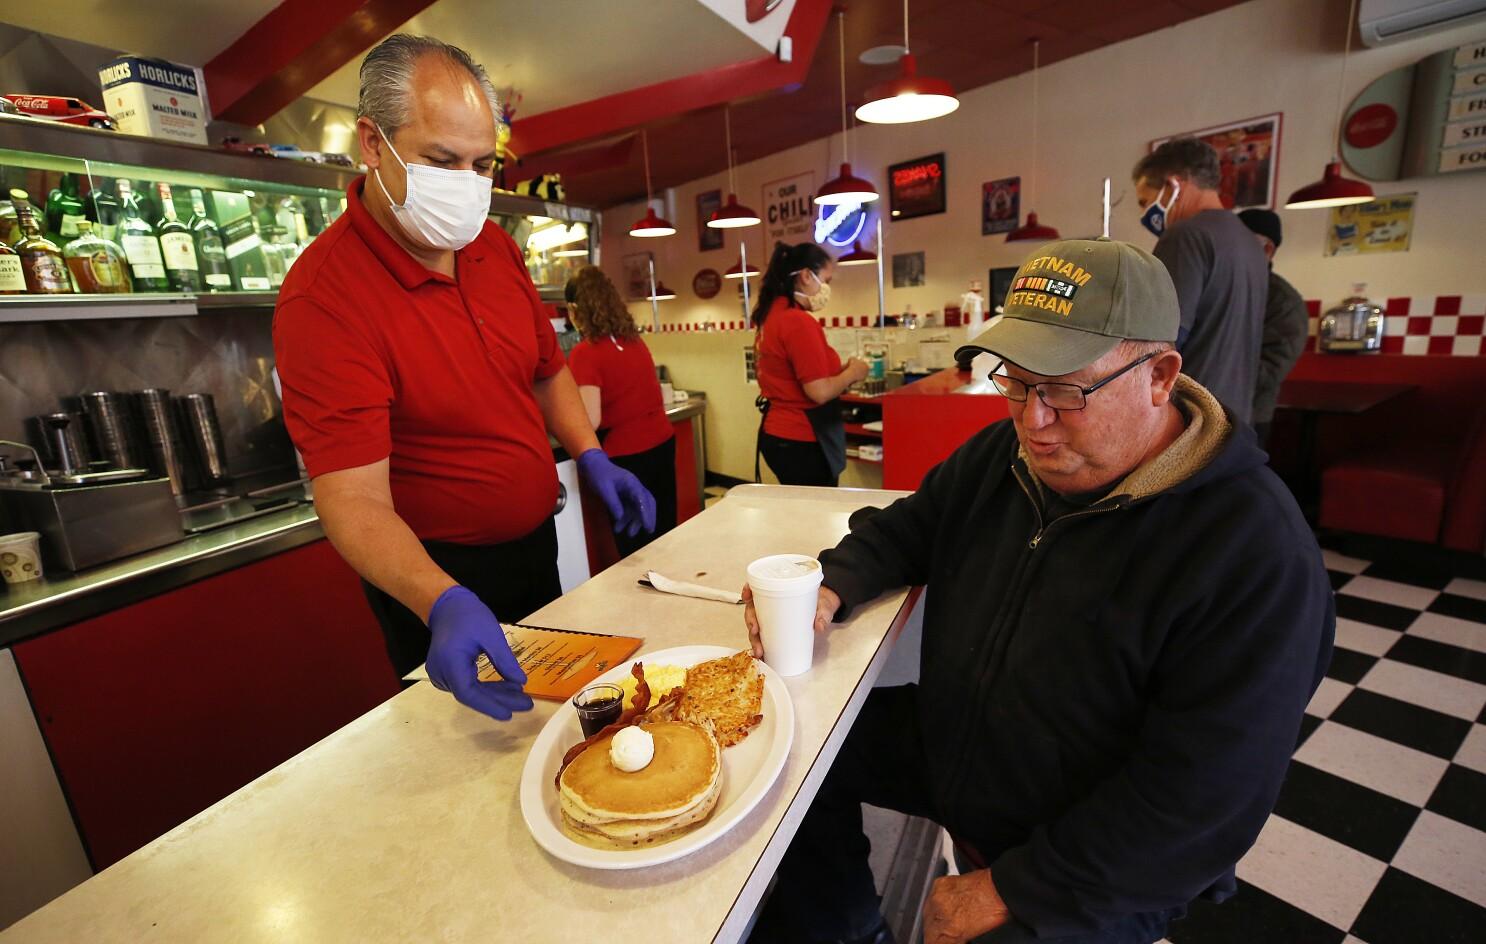 Restaurants Open On Christmas Day 2020 Ventura County Ventura County reopens dine in restaurants and in store shopping